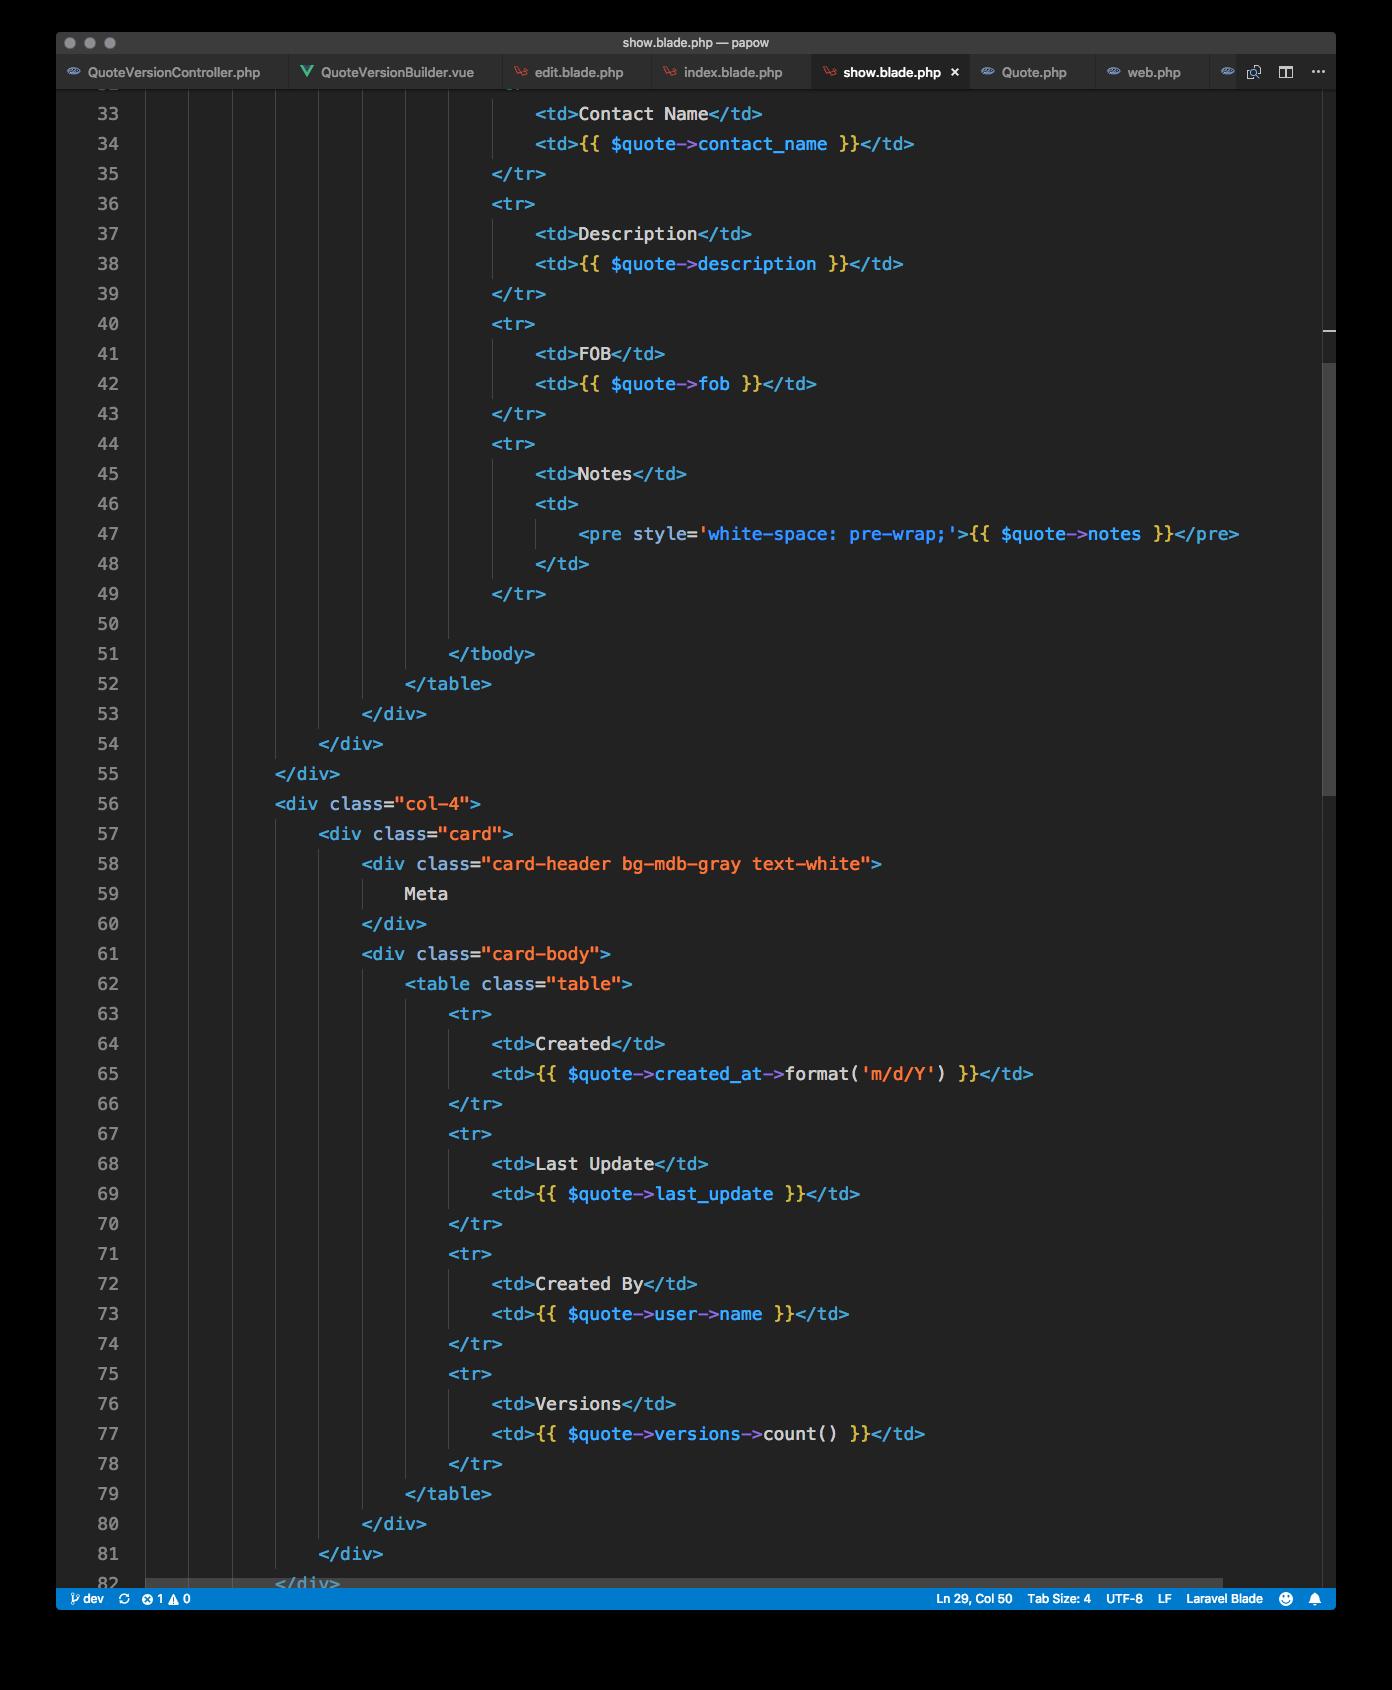 HTML/Blade